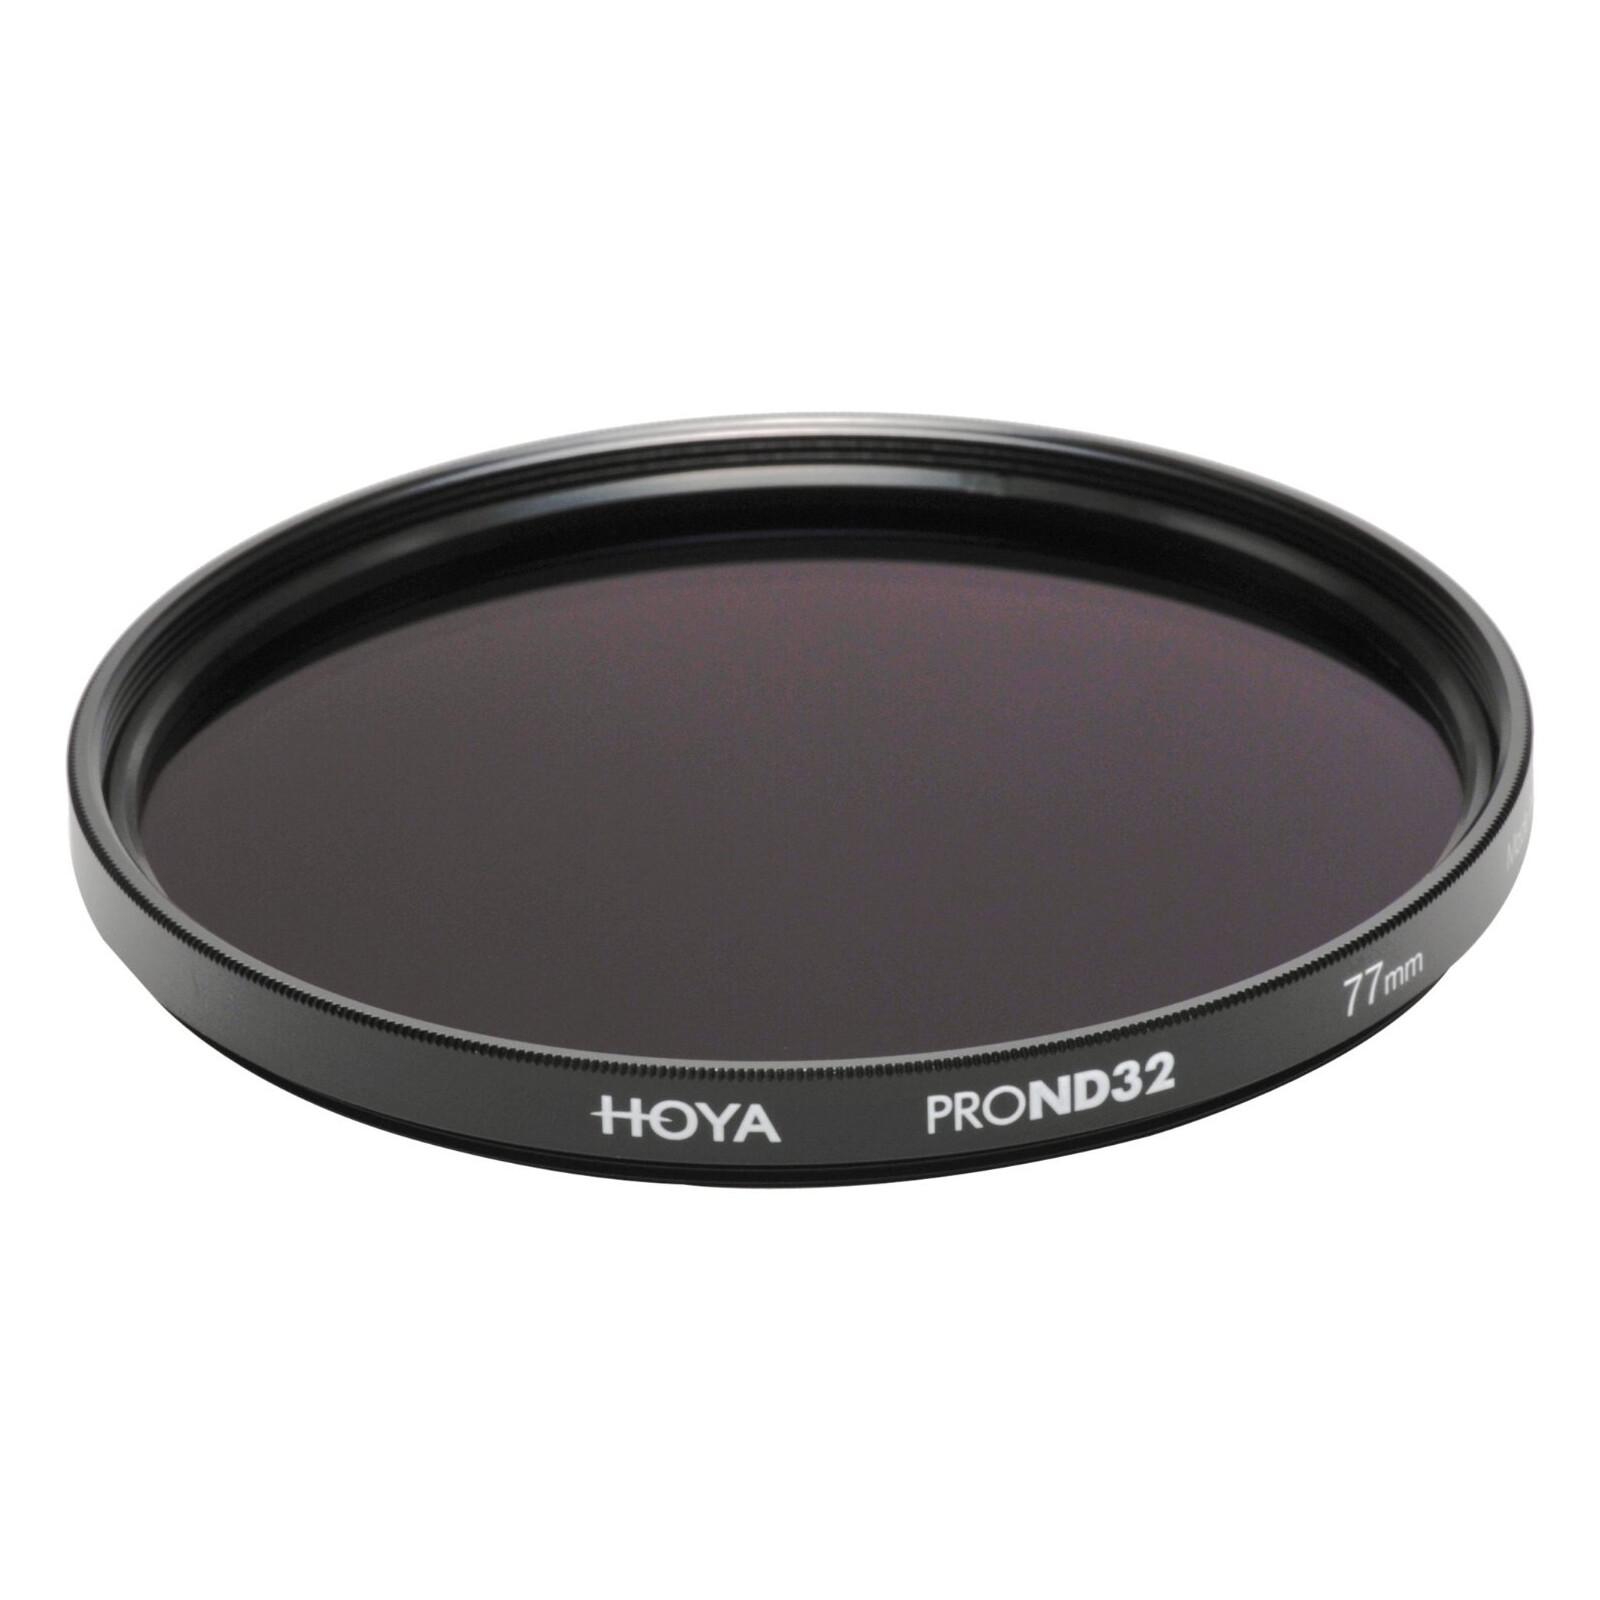 Hoya Grau PRO ND 32 82mm